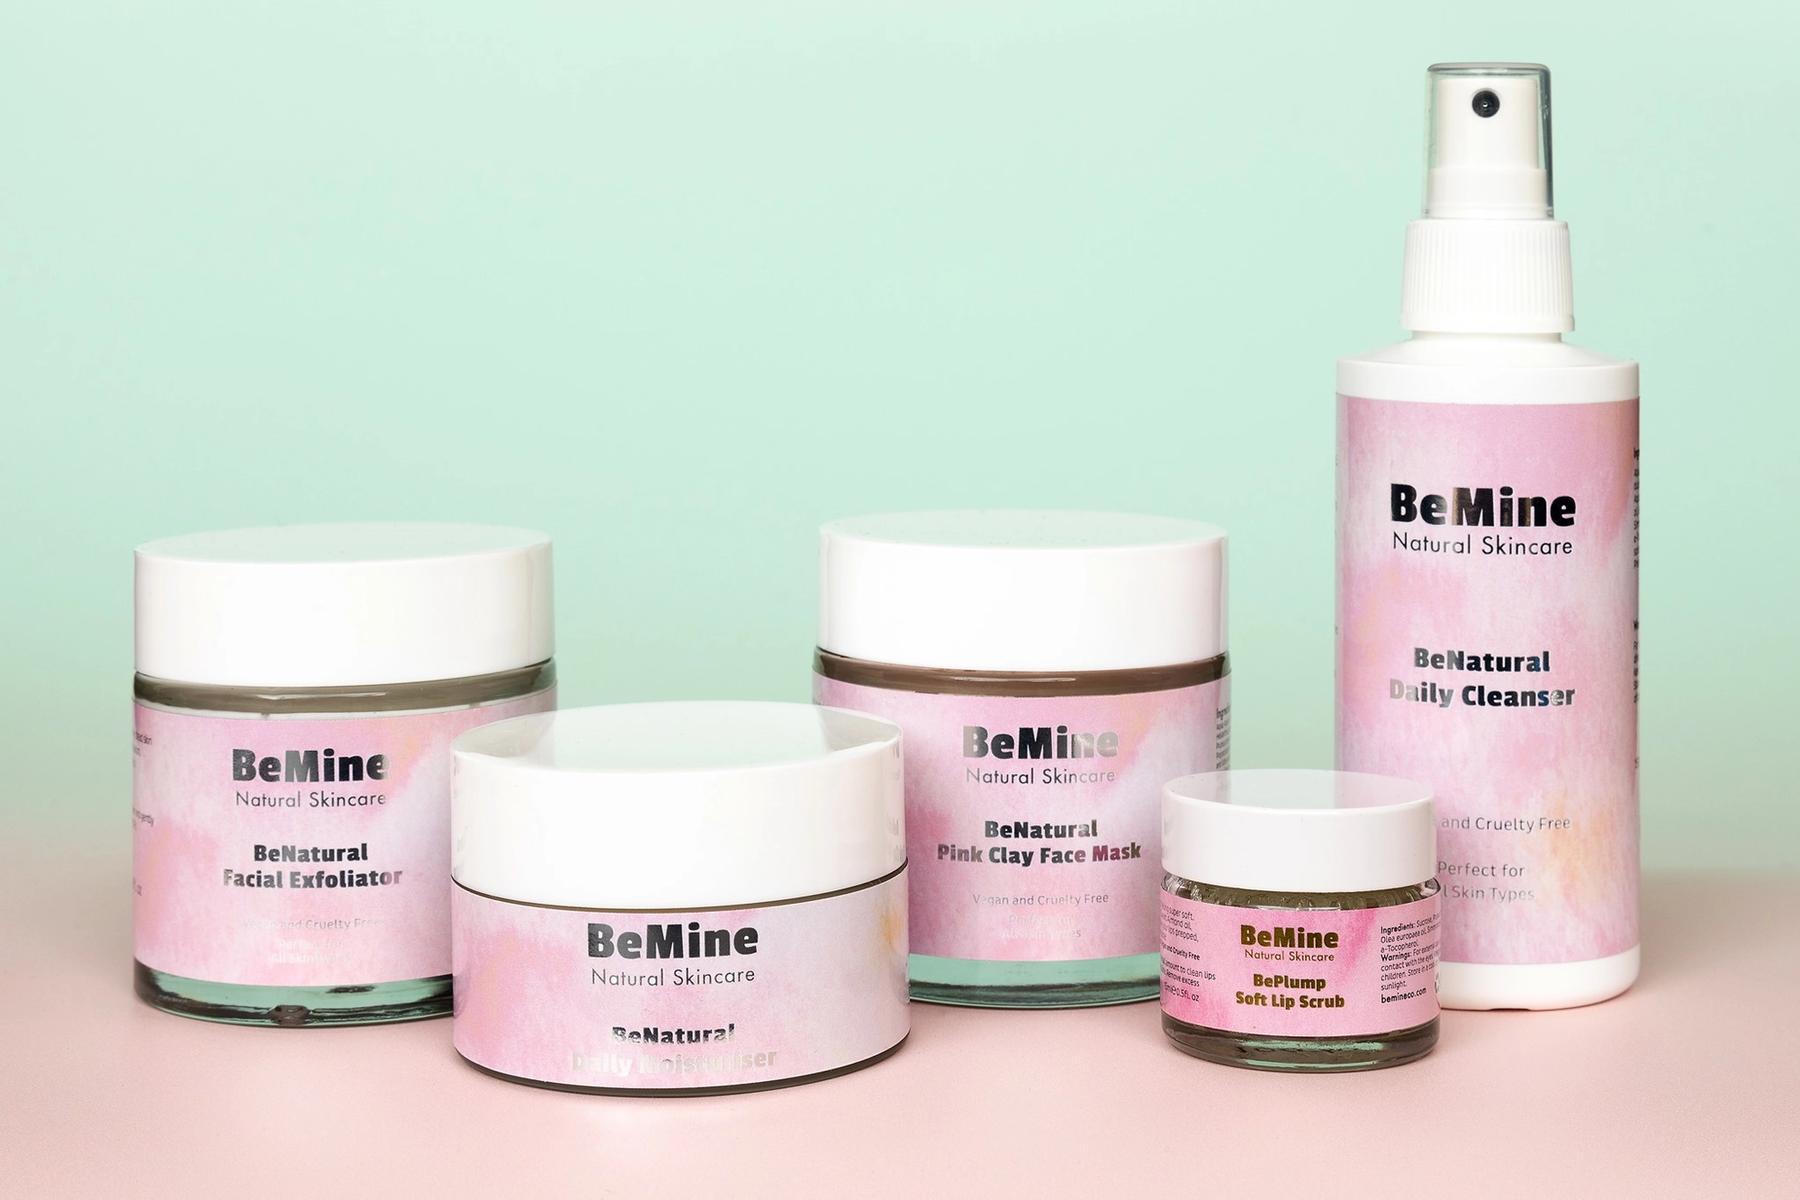 BeMine Natural Skincare